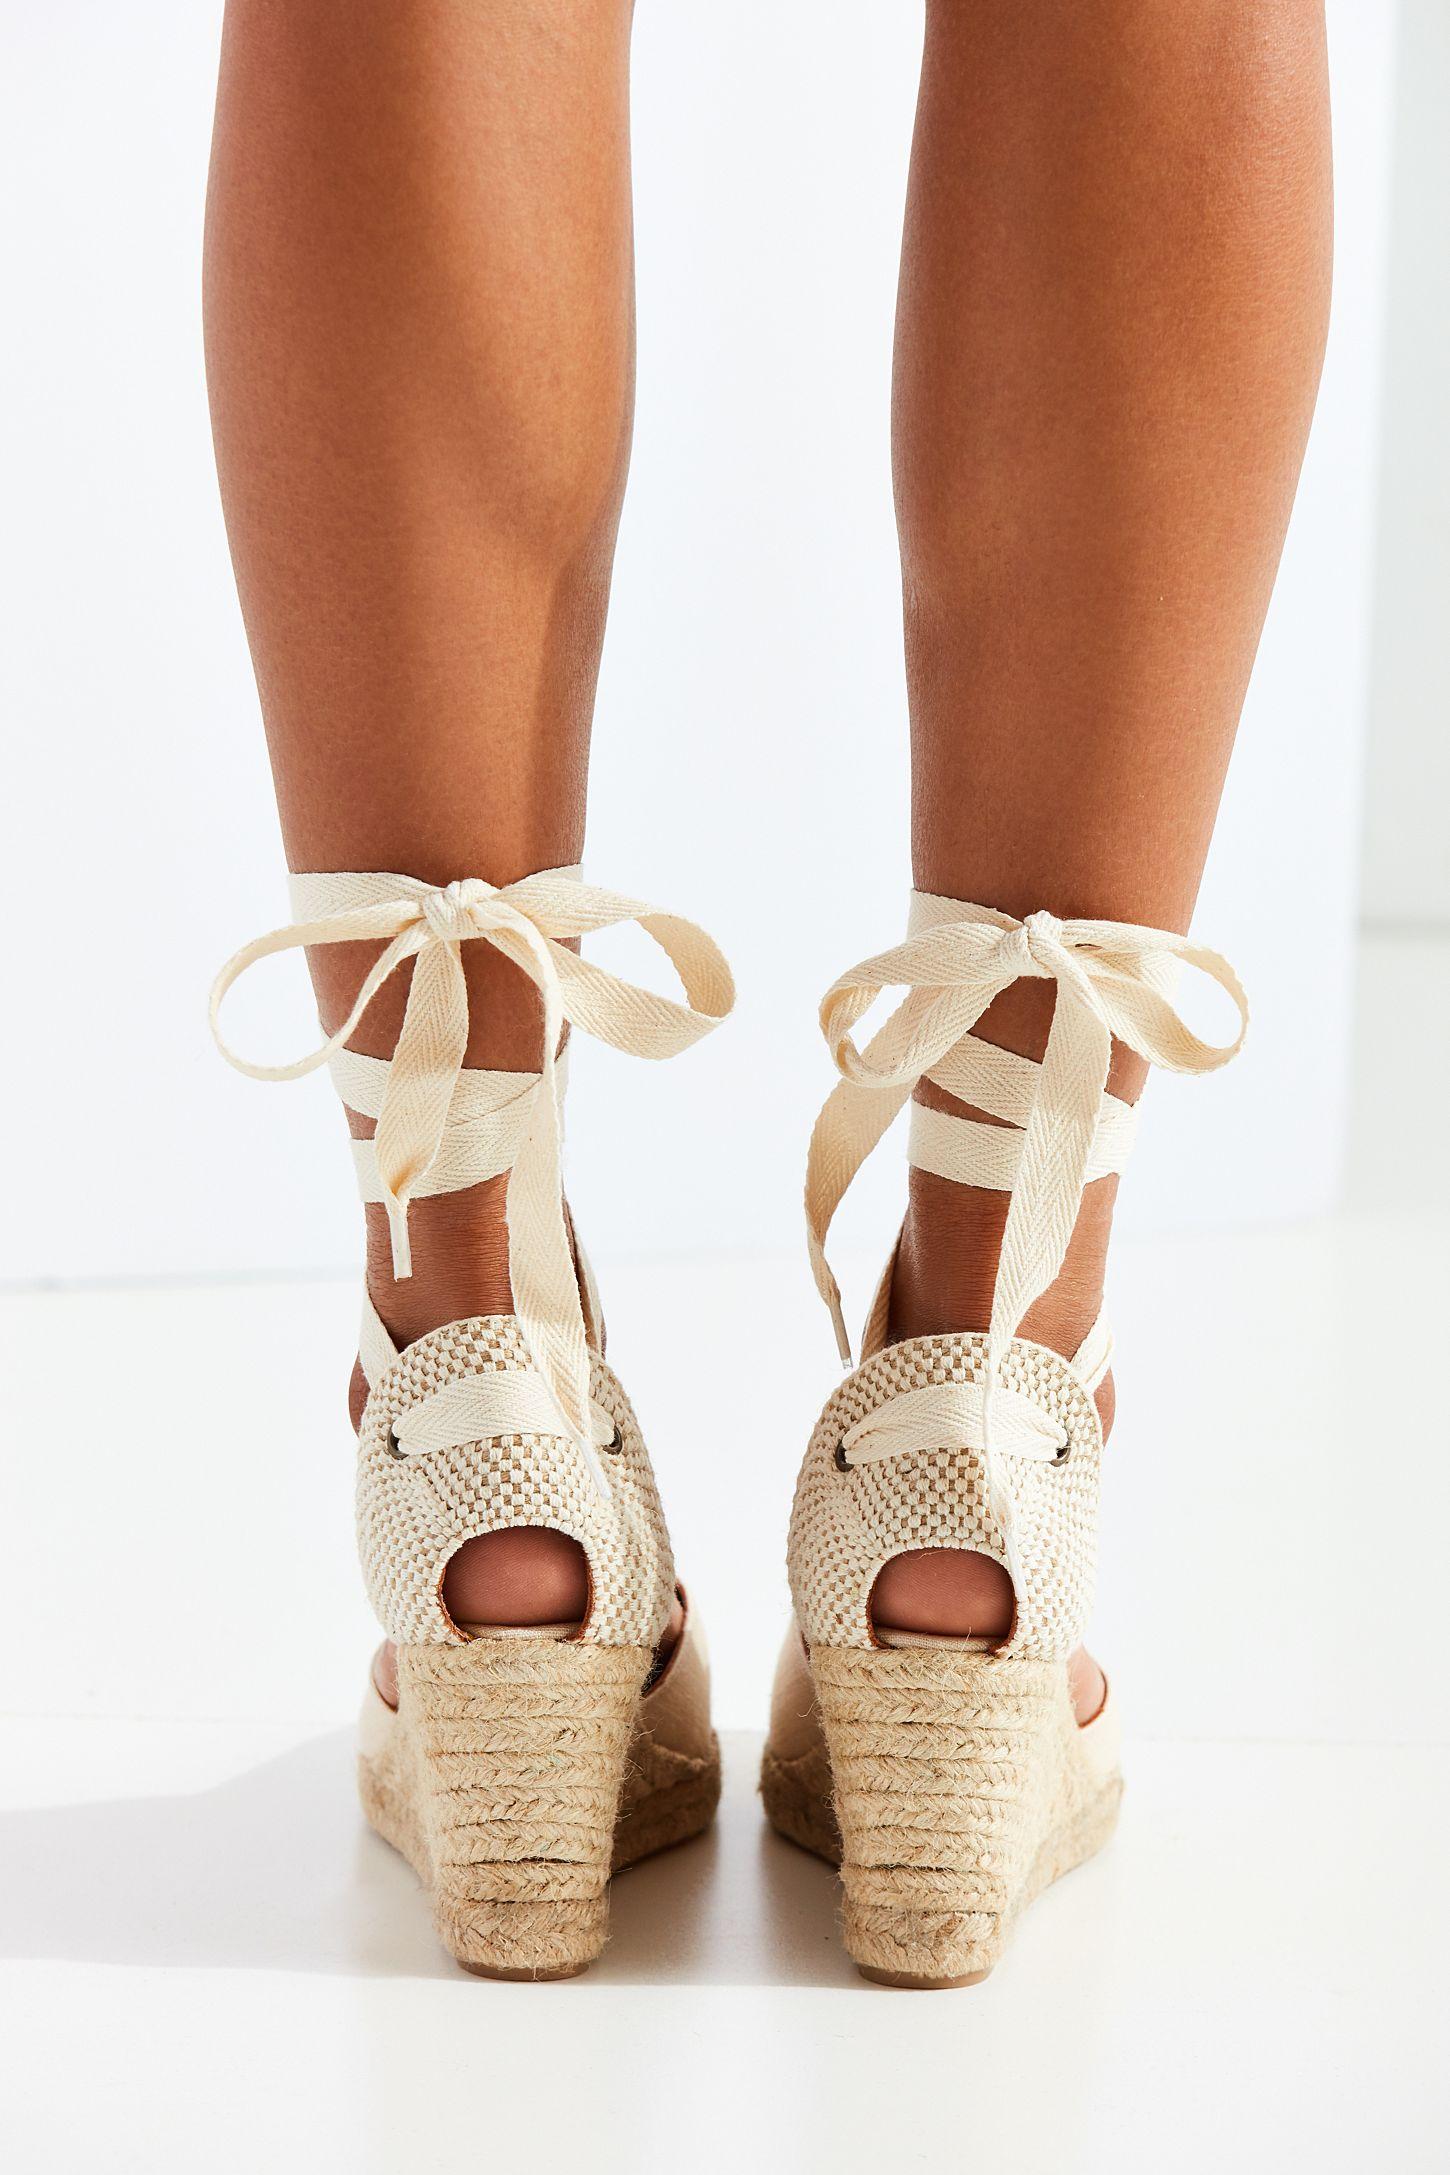 77d52f0e7c6 Slide View  6  Soludos Linen Espadrille Tall Wedge Sandal